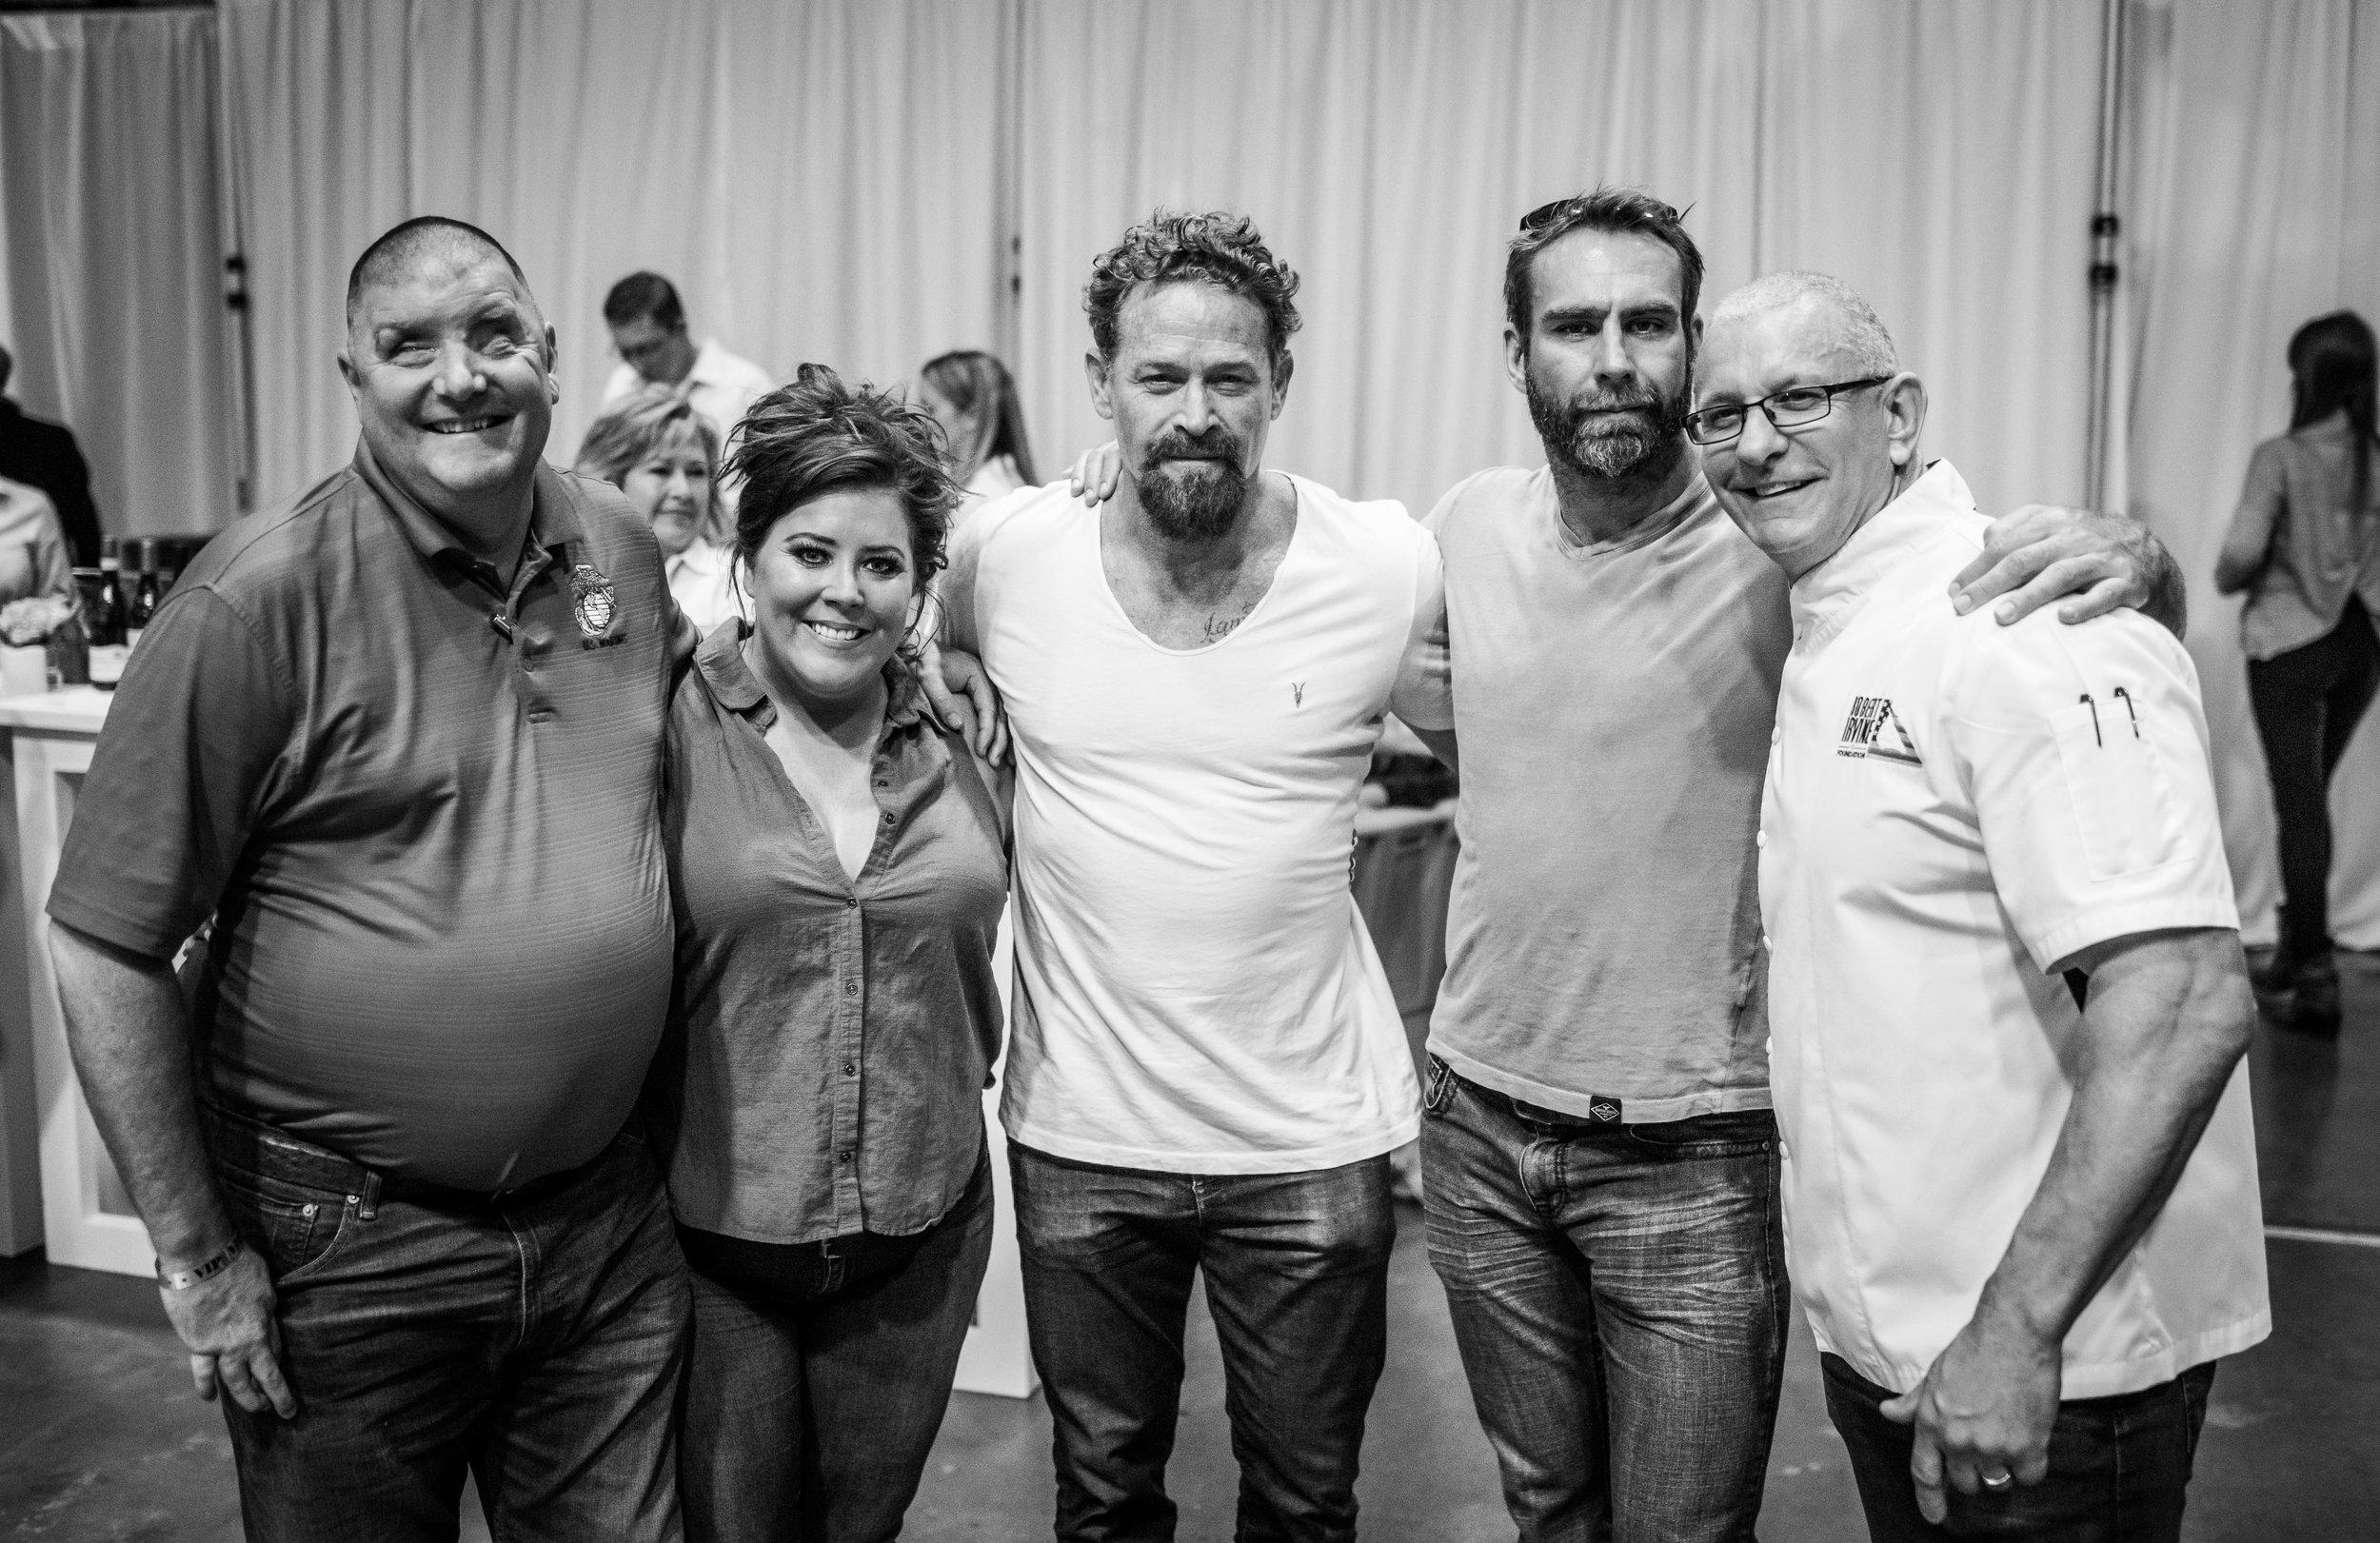 Michael, Kim, Max Martini (13 hours), David Brandon (former Navy SEAL, actor), and Robert Irvine (Chef) at Skyball.